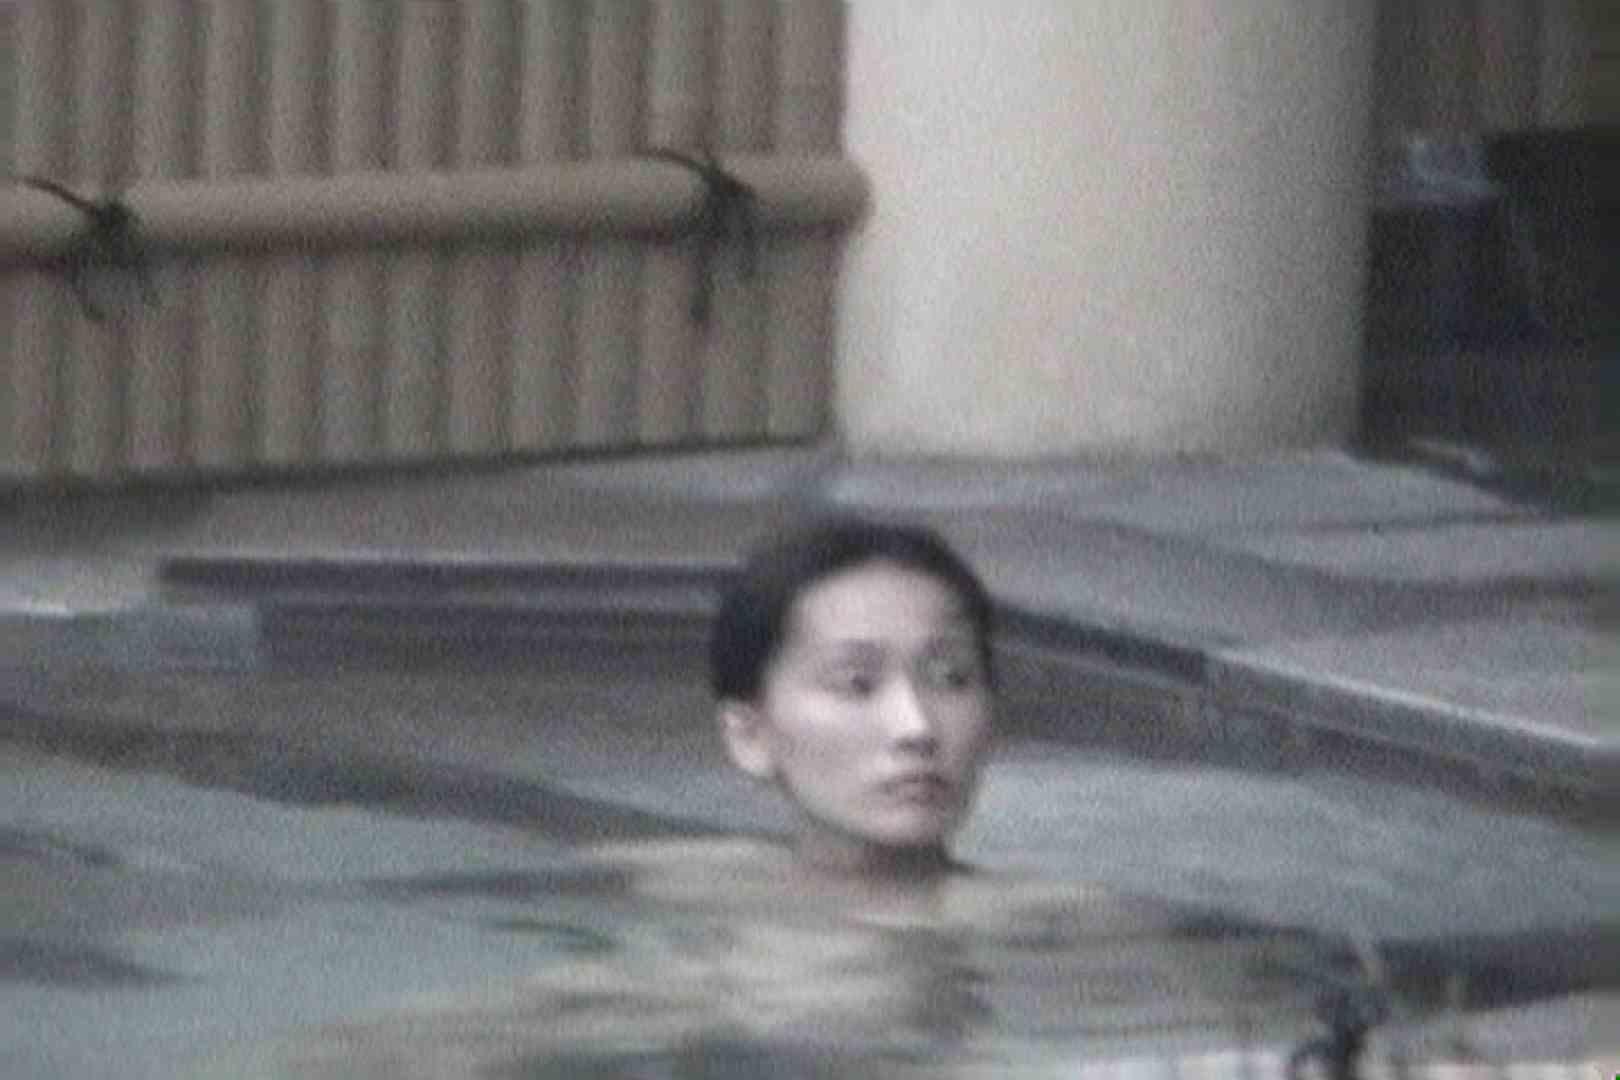 Aquaな露天風呂Vol.557 露天 われめAV動画紹介 78枚 2